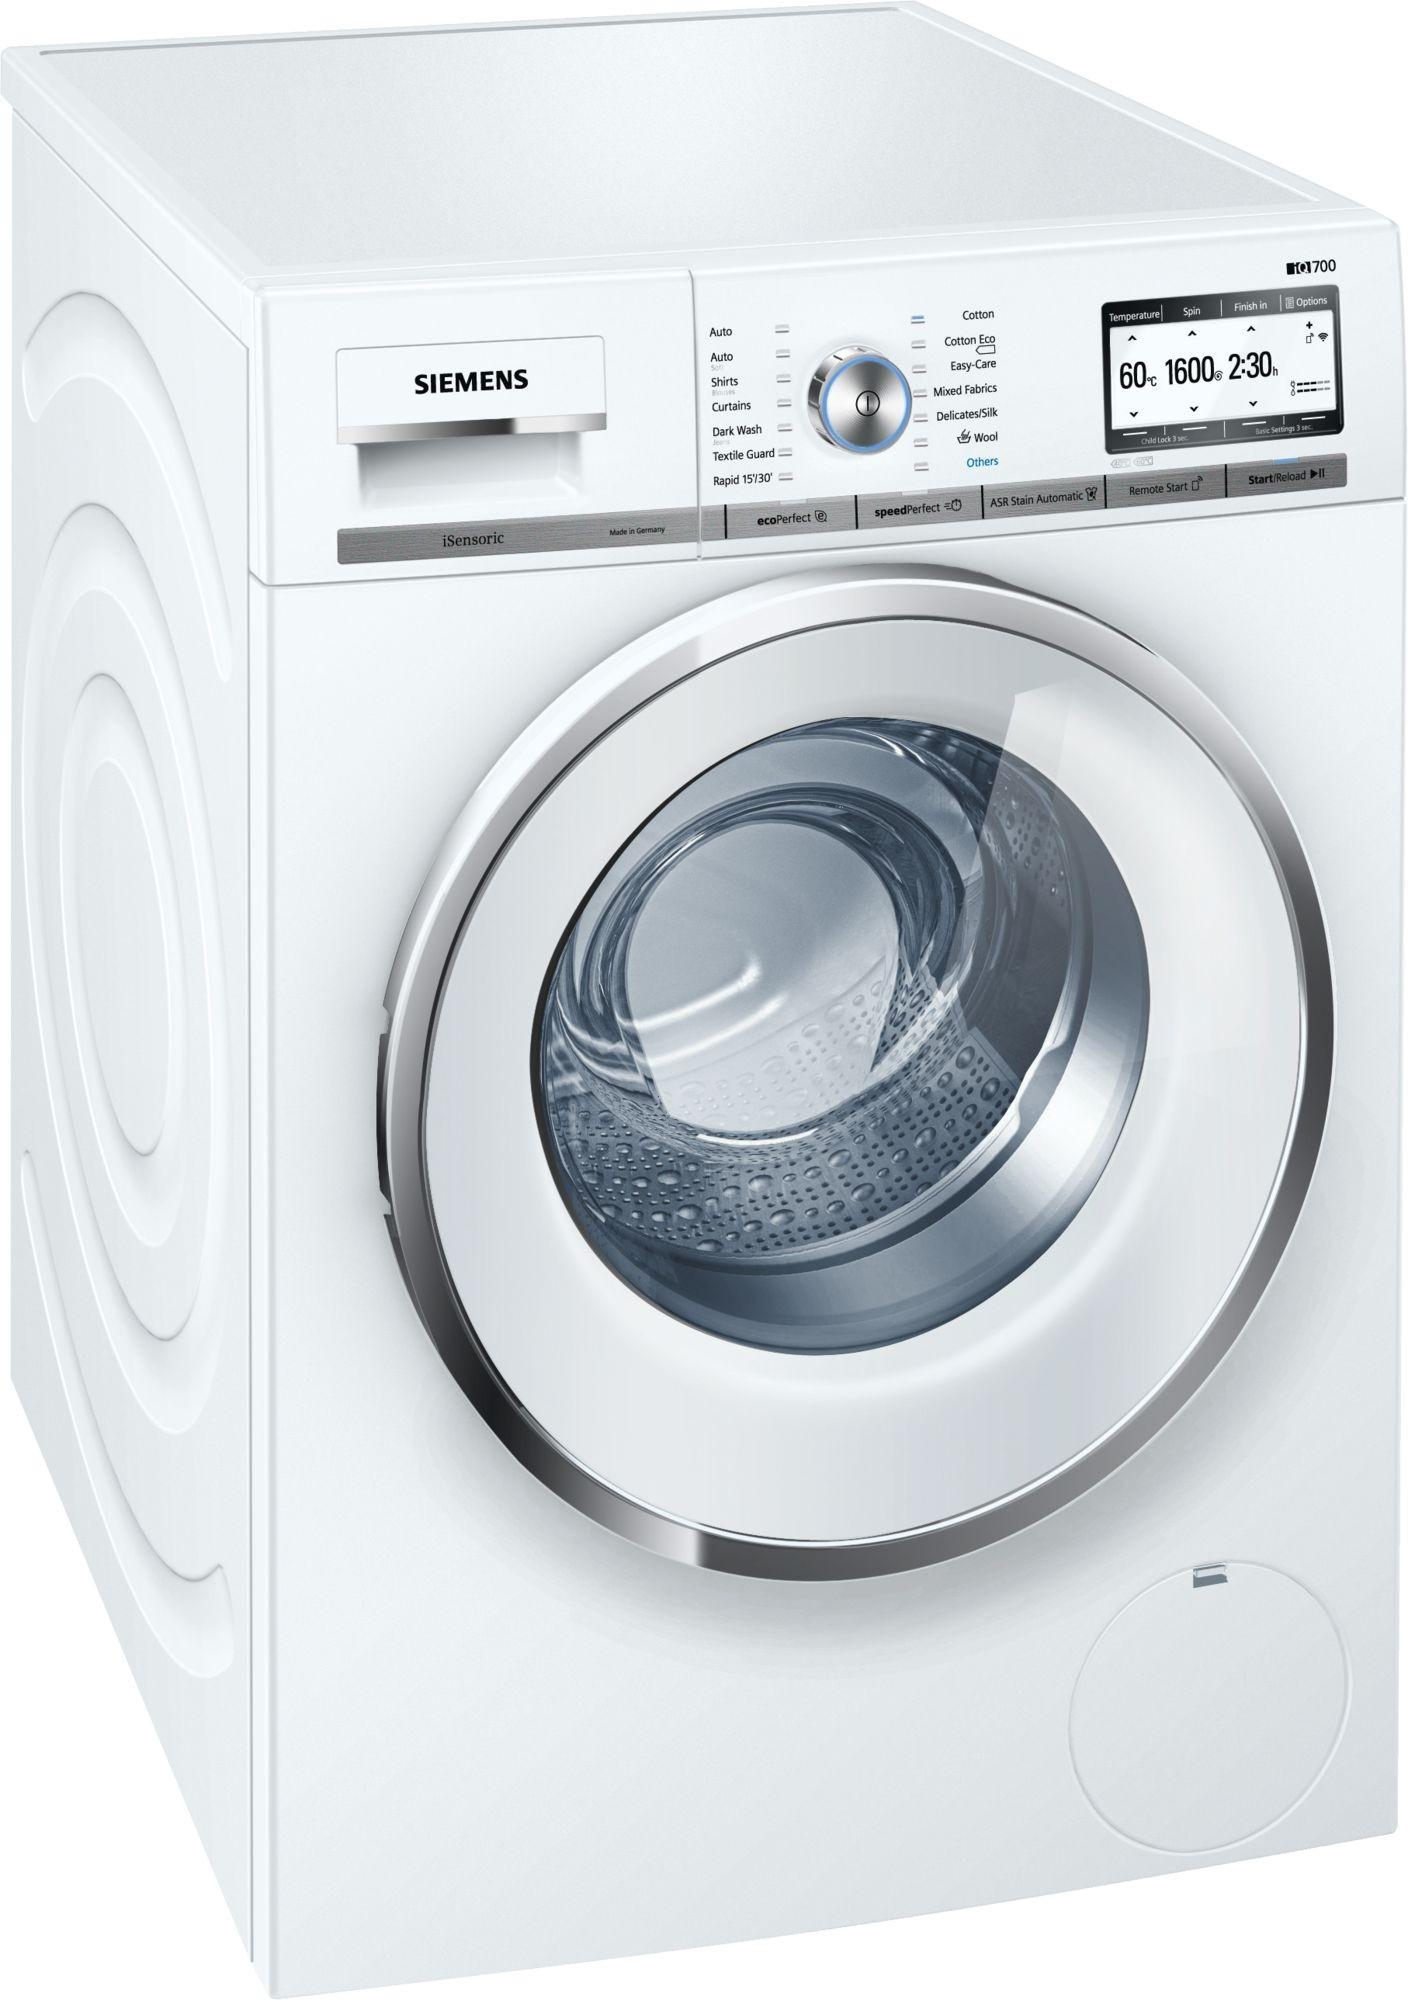 Siemens WMH6Y790GB 9kg 1600rpm Washing Machine